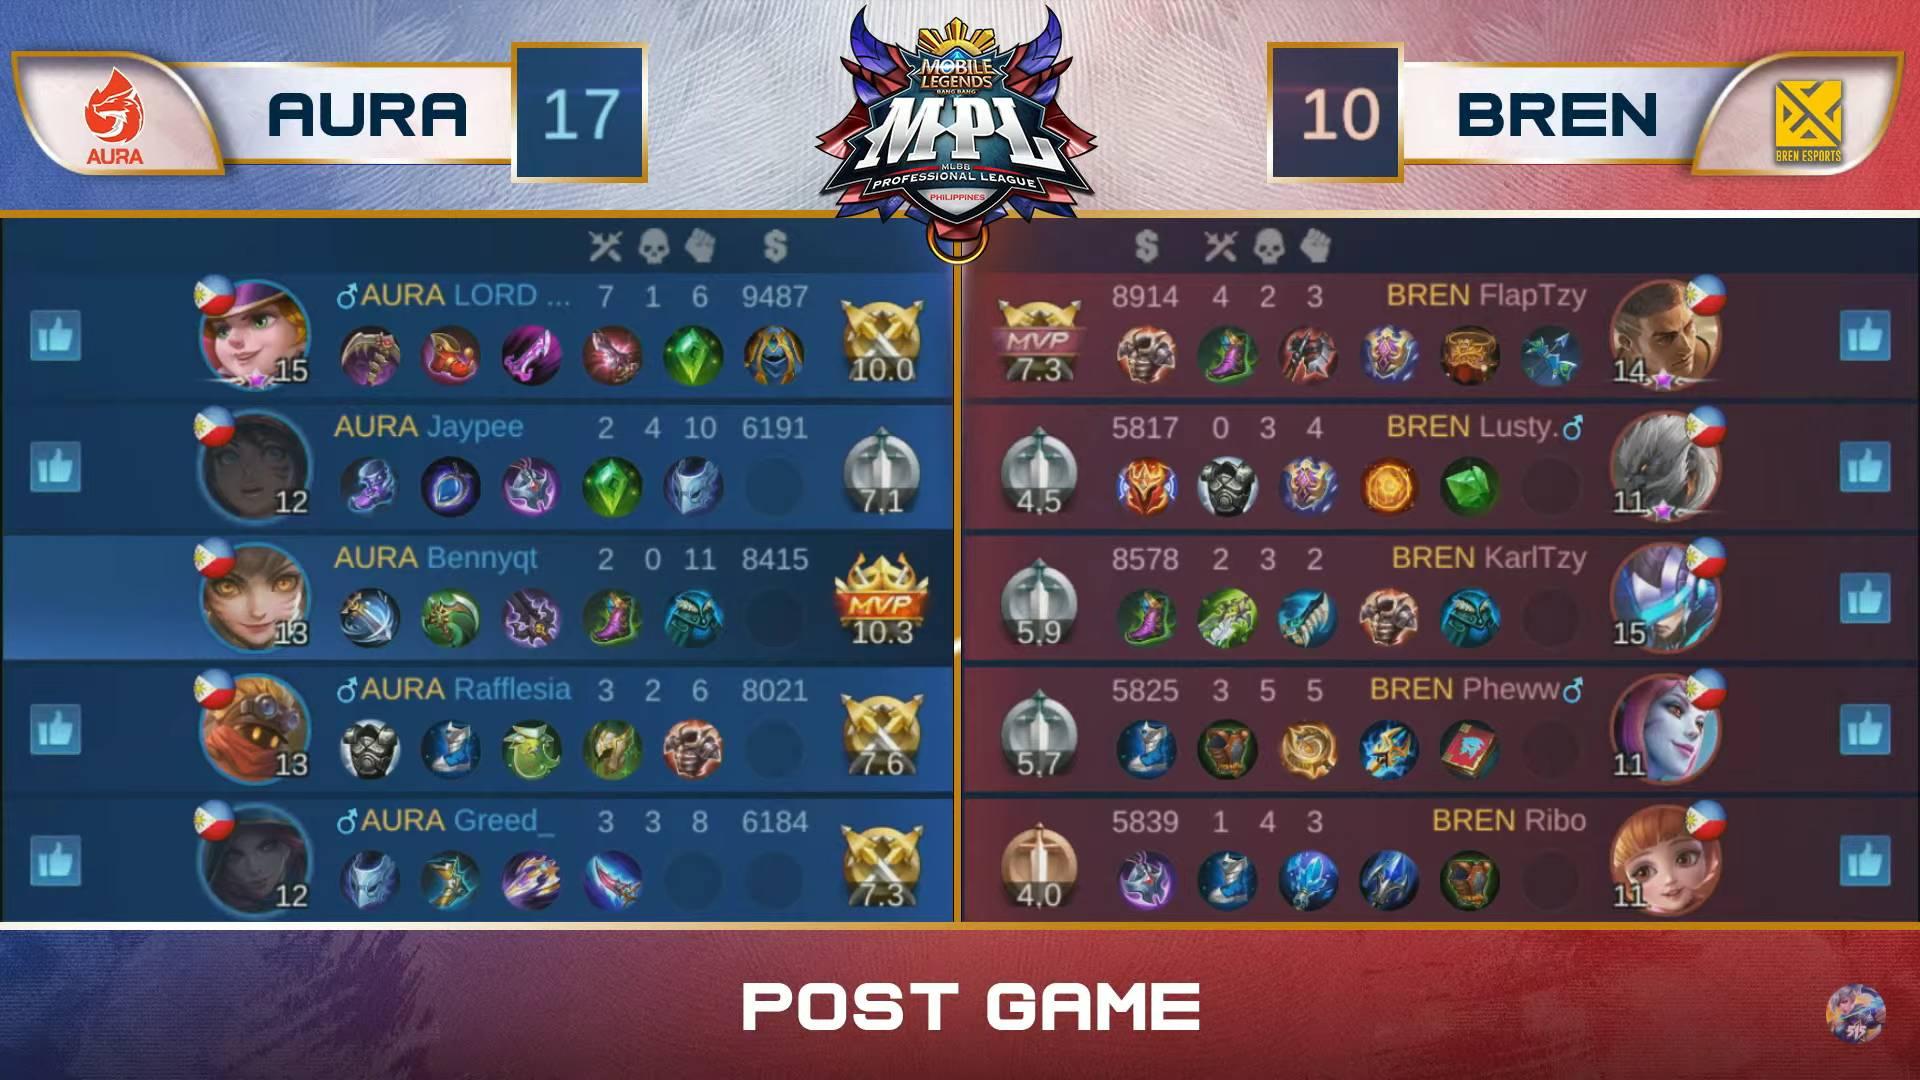 MPL-PH-Season-7-Aura-def-Bren-Game-1 Bennyqt takes over late vs Bren as Aura gains share of MPL PH lead ESports Mobile Legends MPL-PH News  - philippine sports news